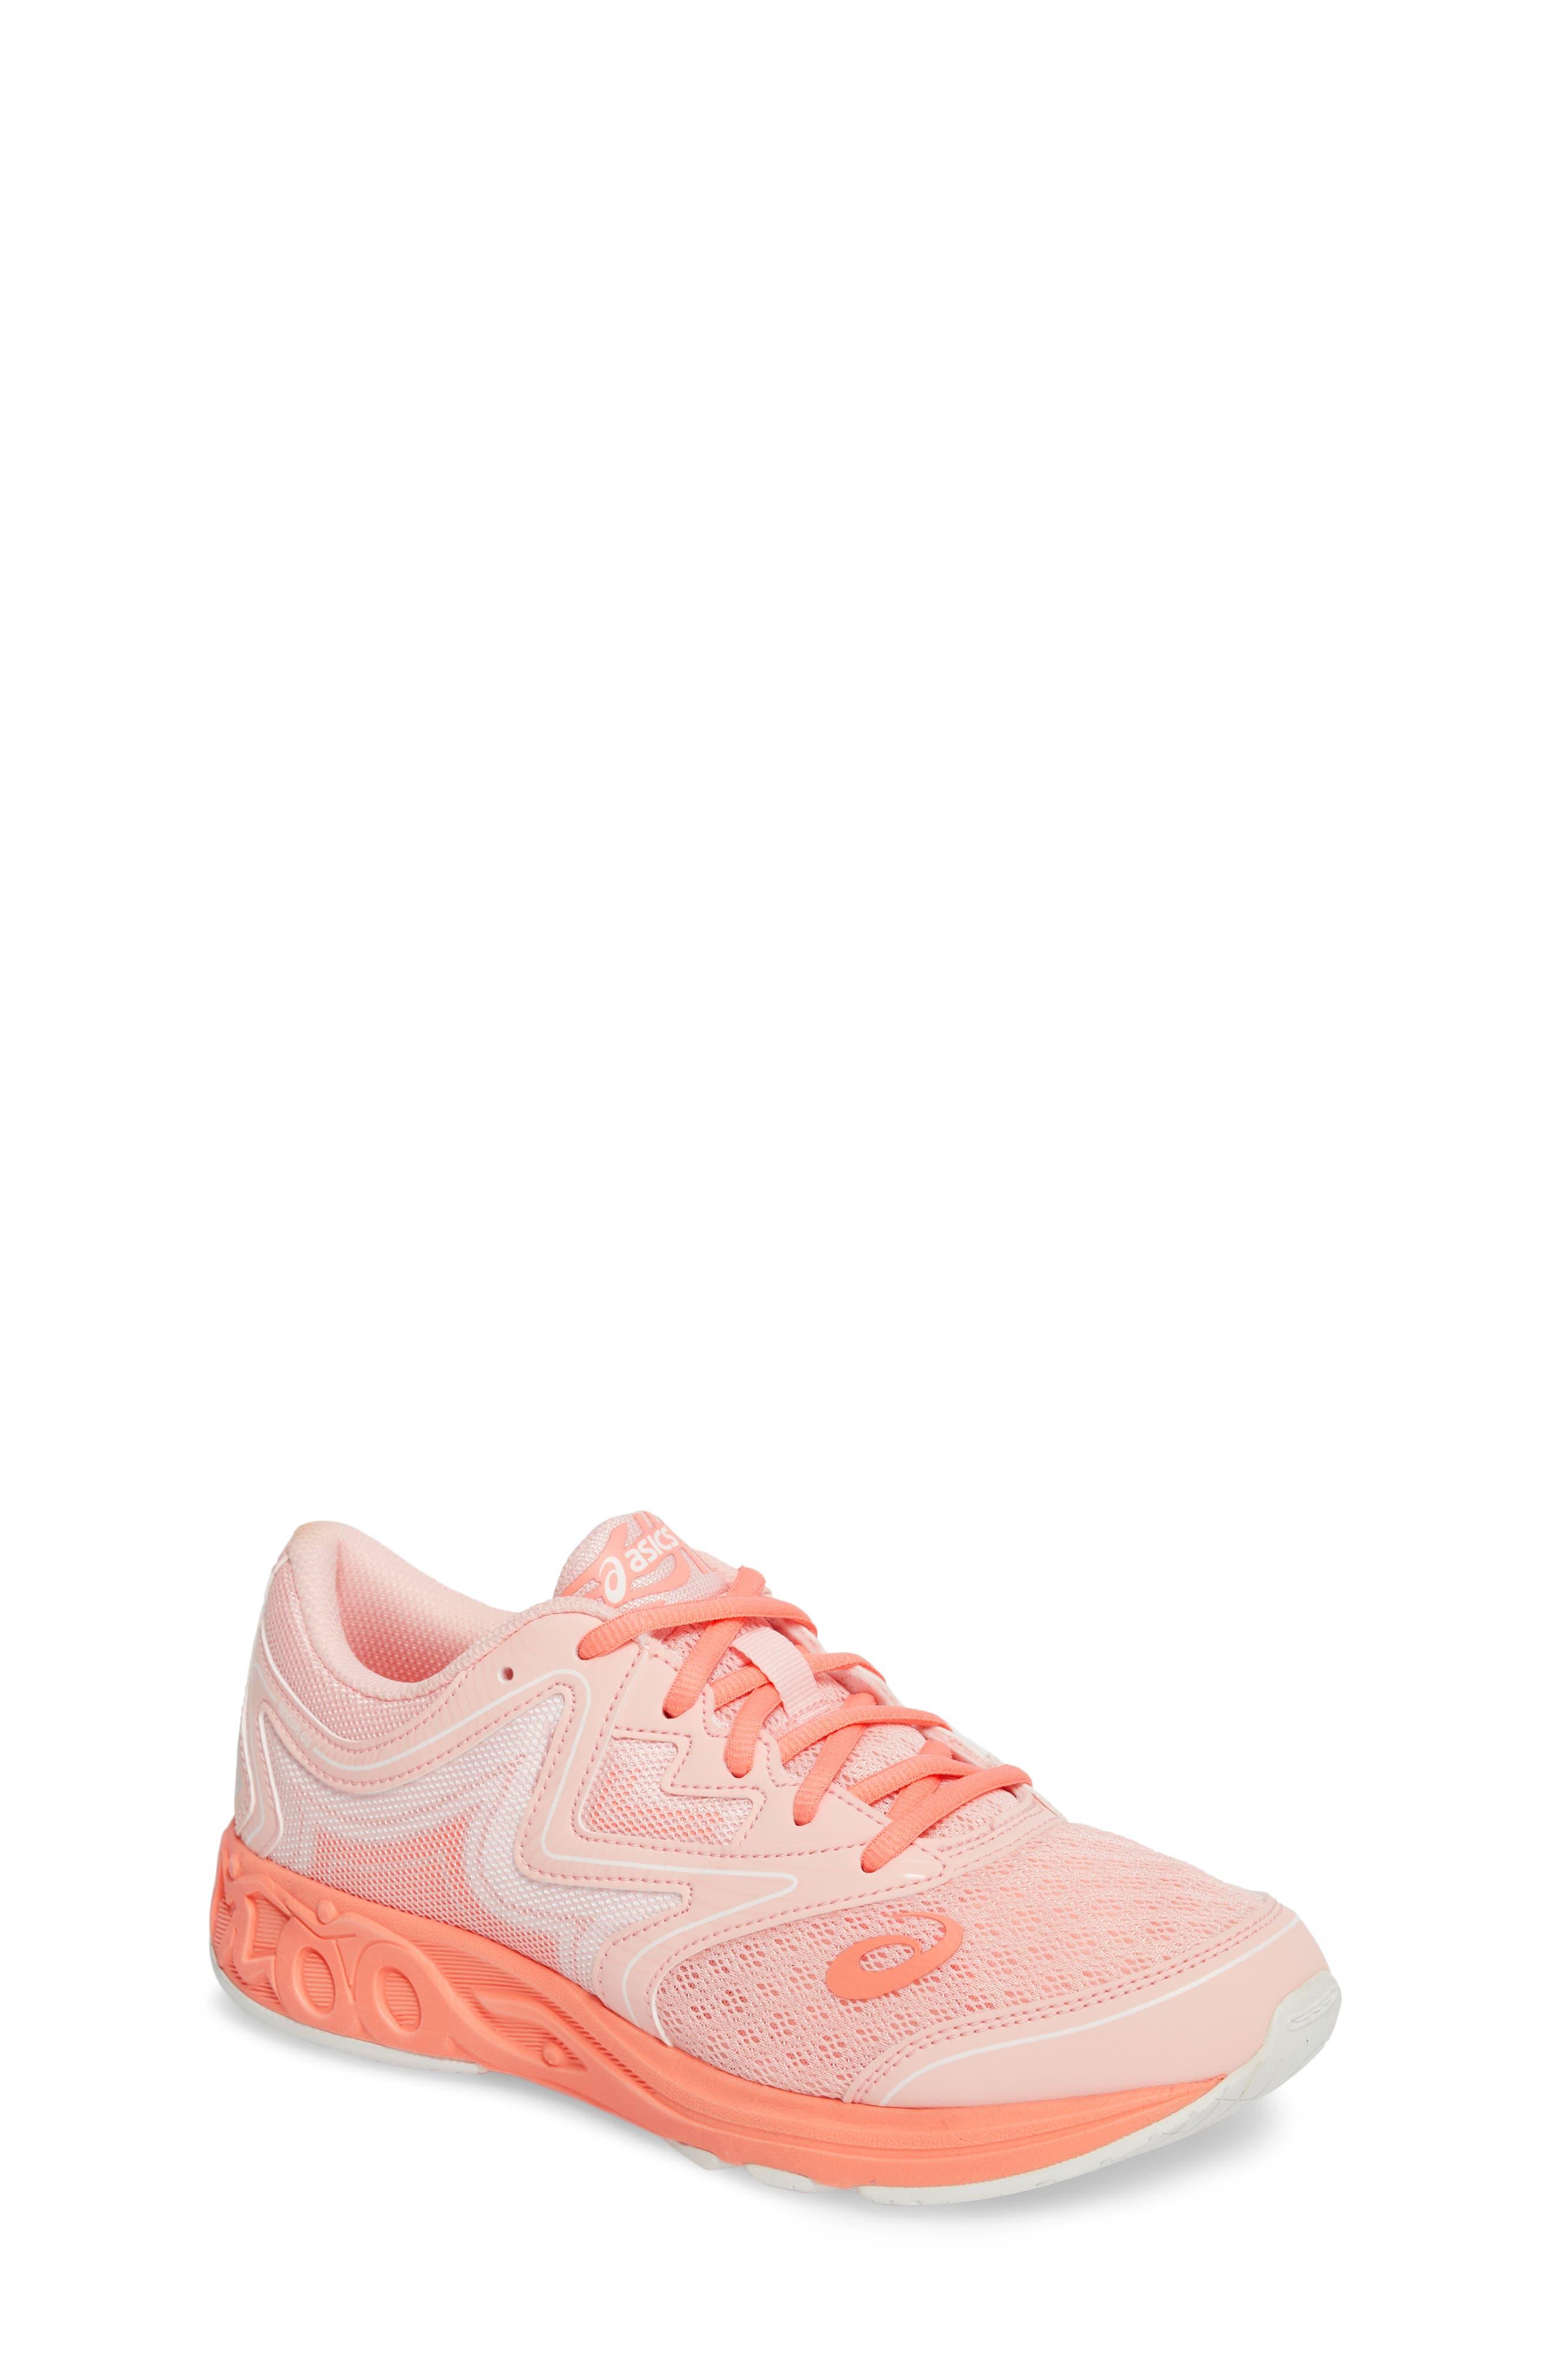 Noosa GS Sneaker,                             Main thumbnail 1, color,                             SEASHELL PINK/ BEGONIA/ WHITE